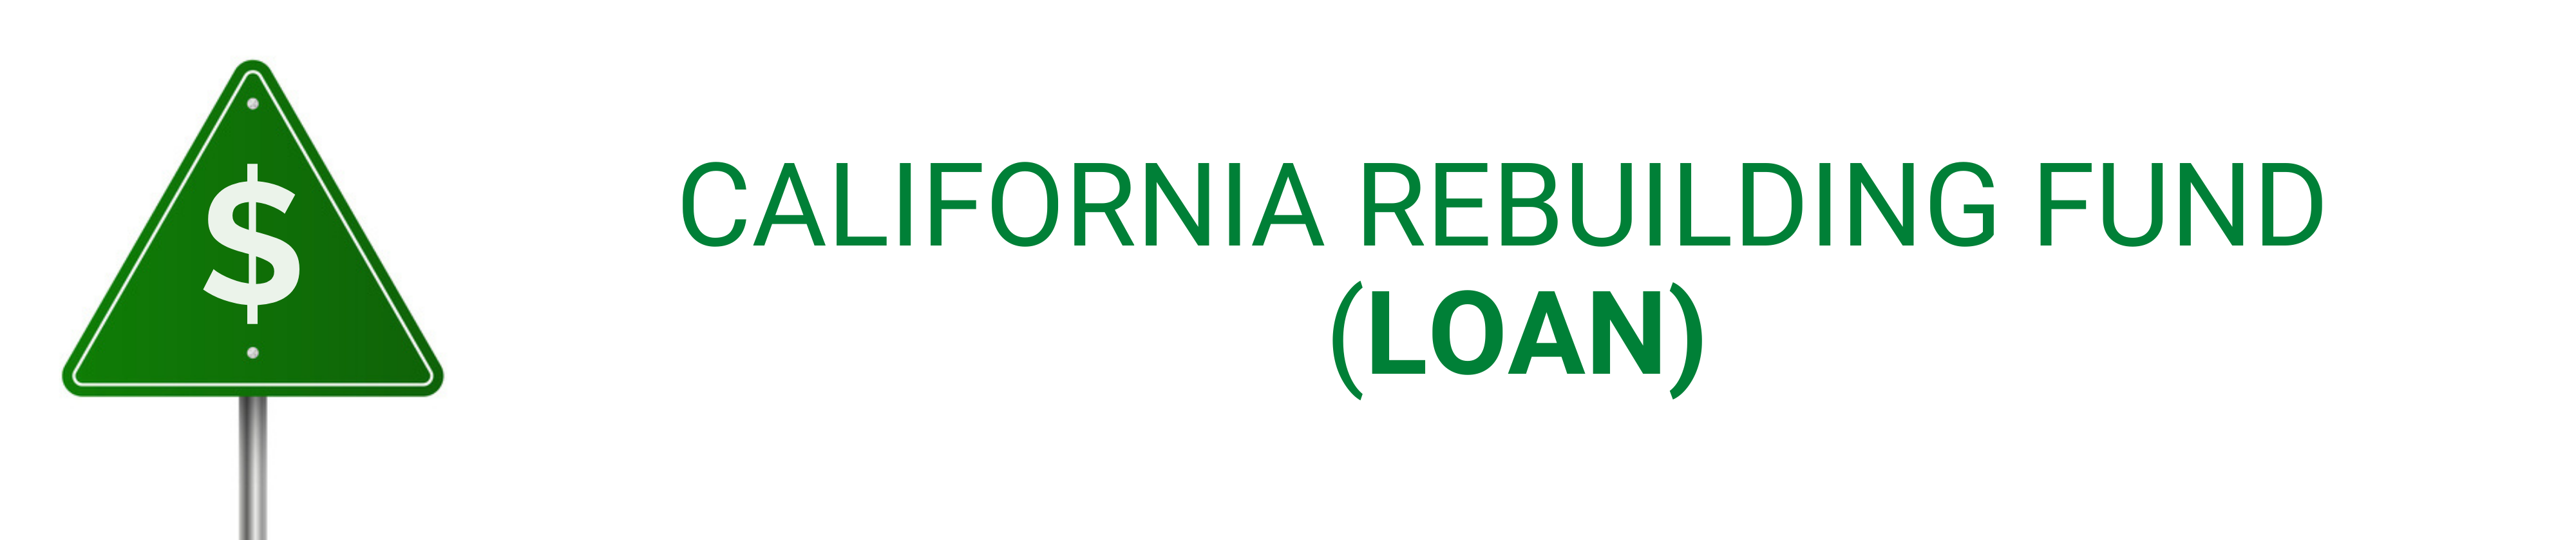 California Rebuilding Fund (Loan)